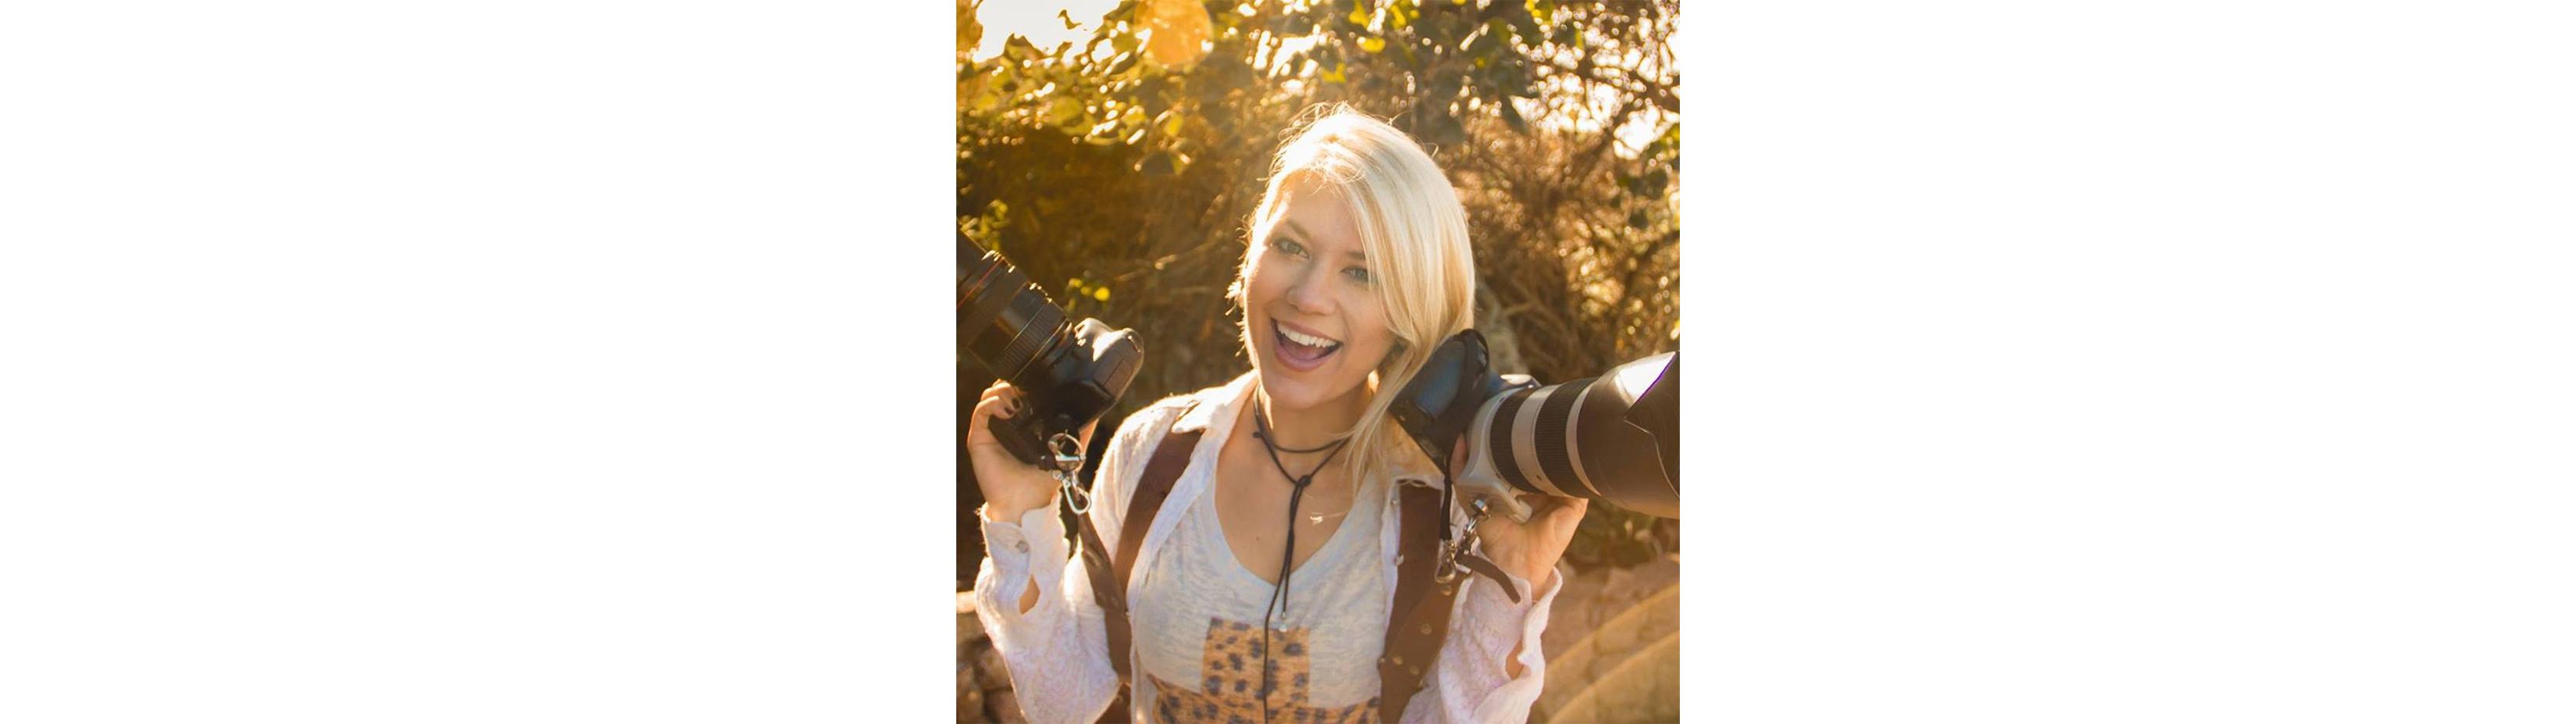 Sobre isis lacombe fotografia e filmagem